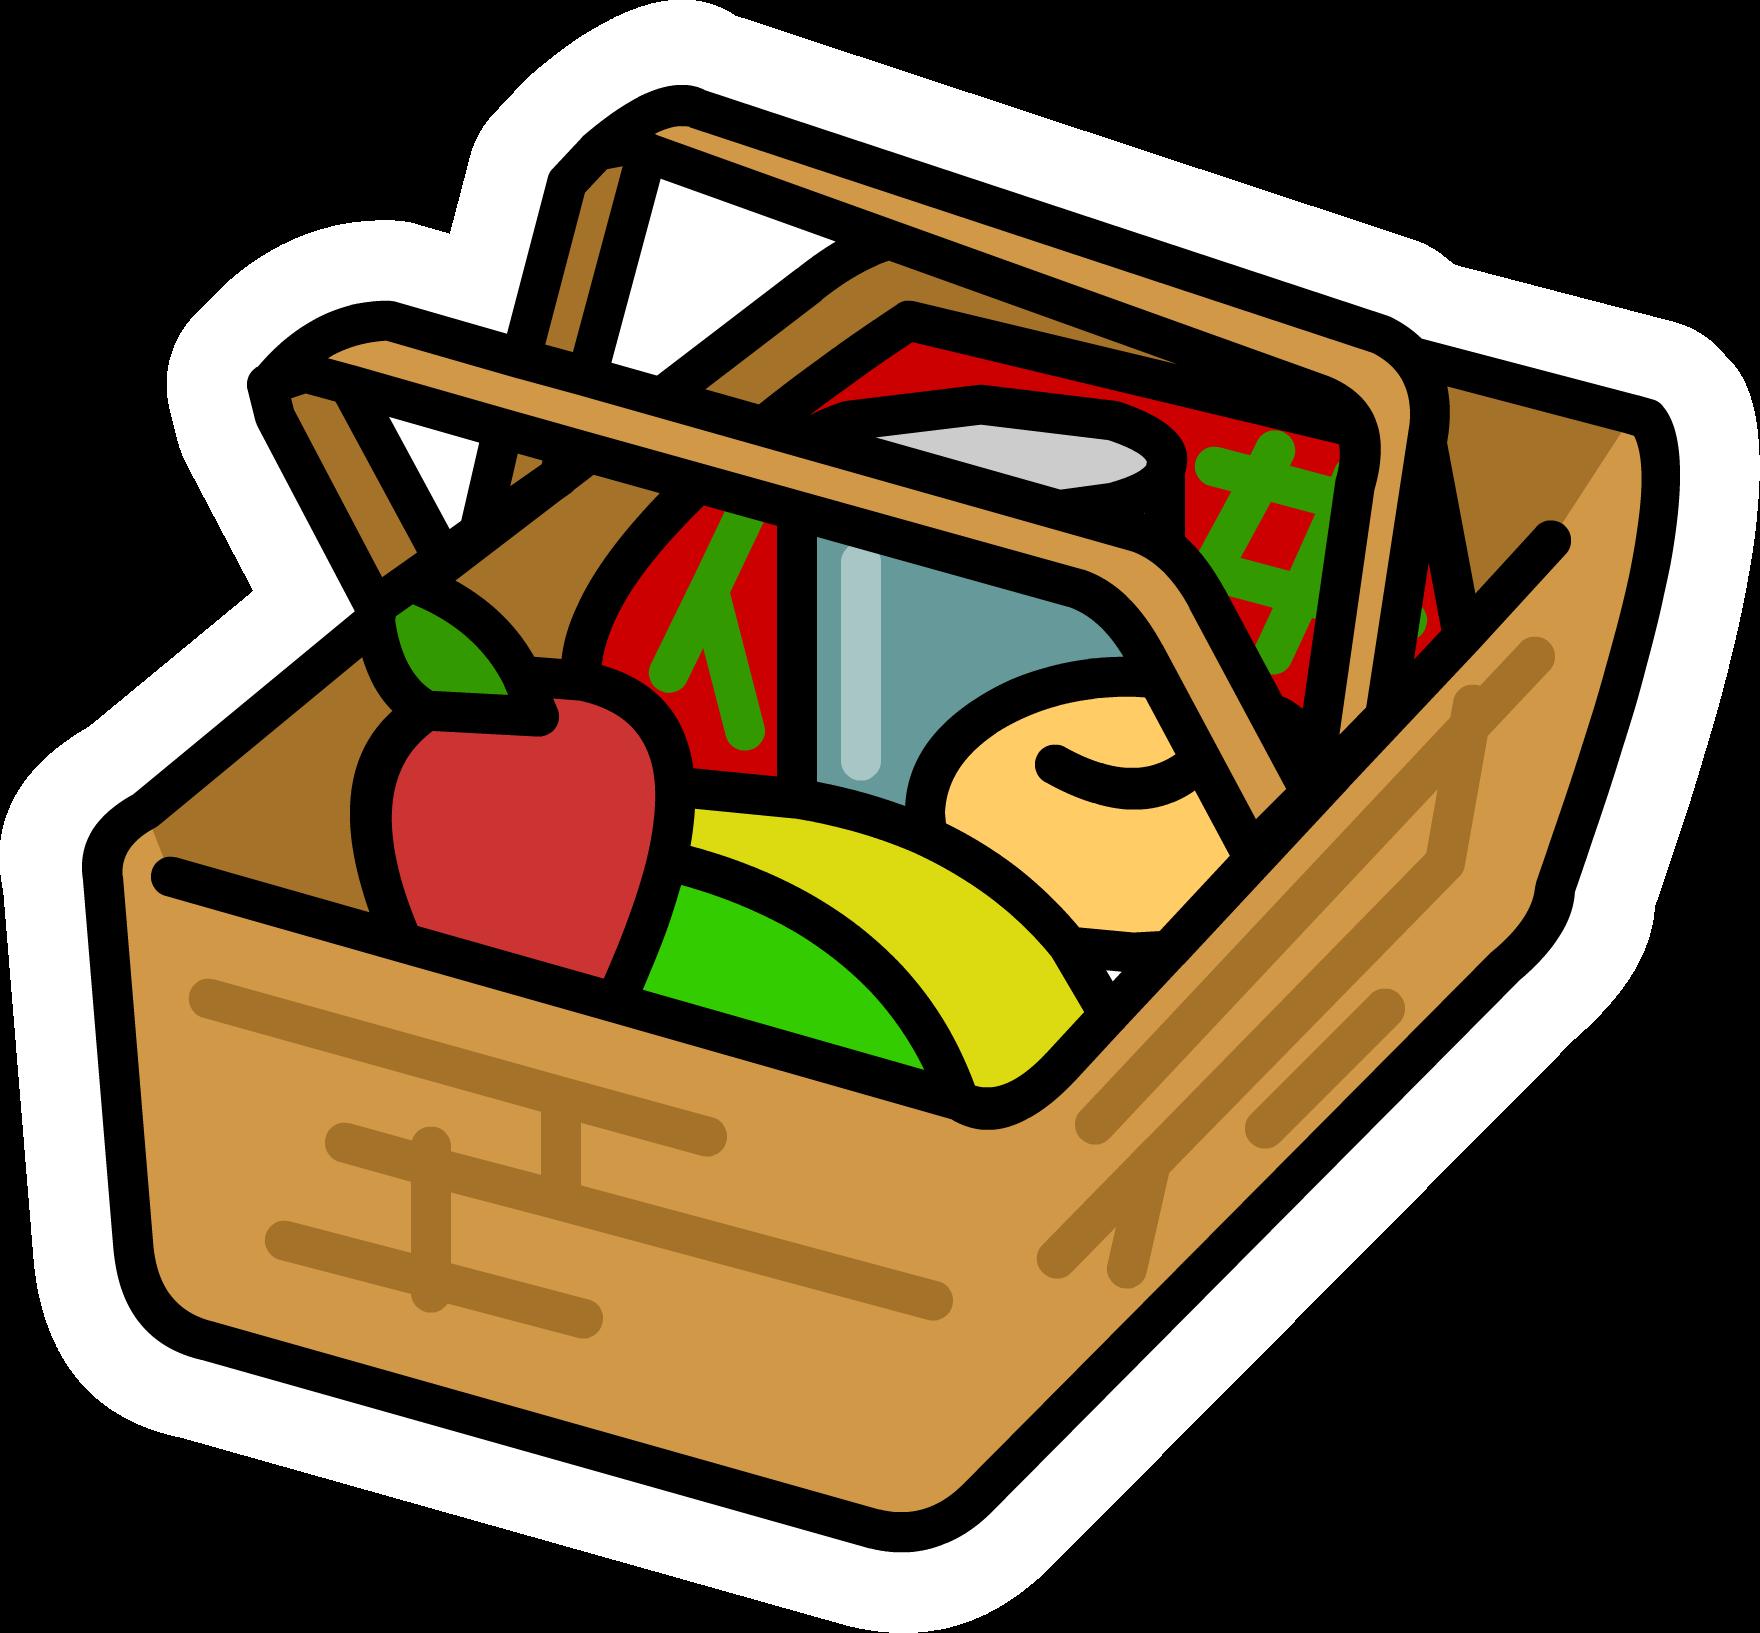 1760x1633 Picnic Basket Pin Club Penguin Wiki Fandom Powered By Wikia